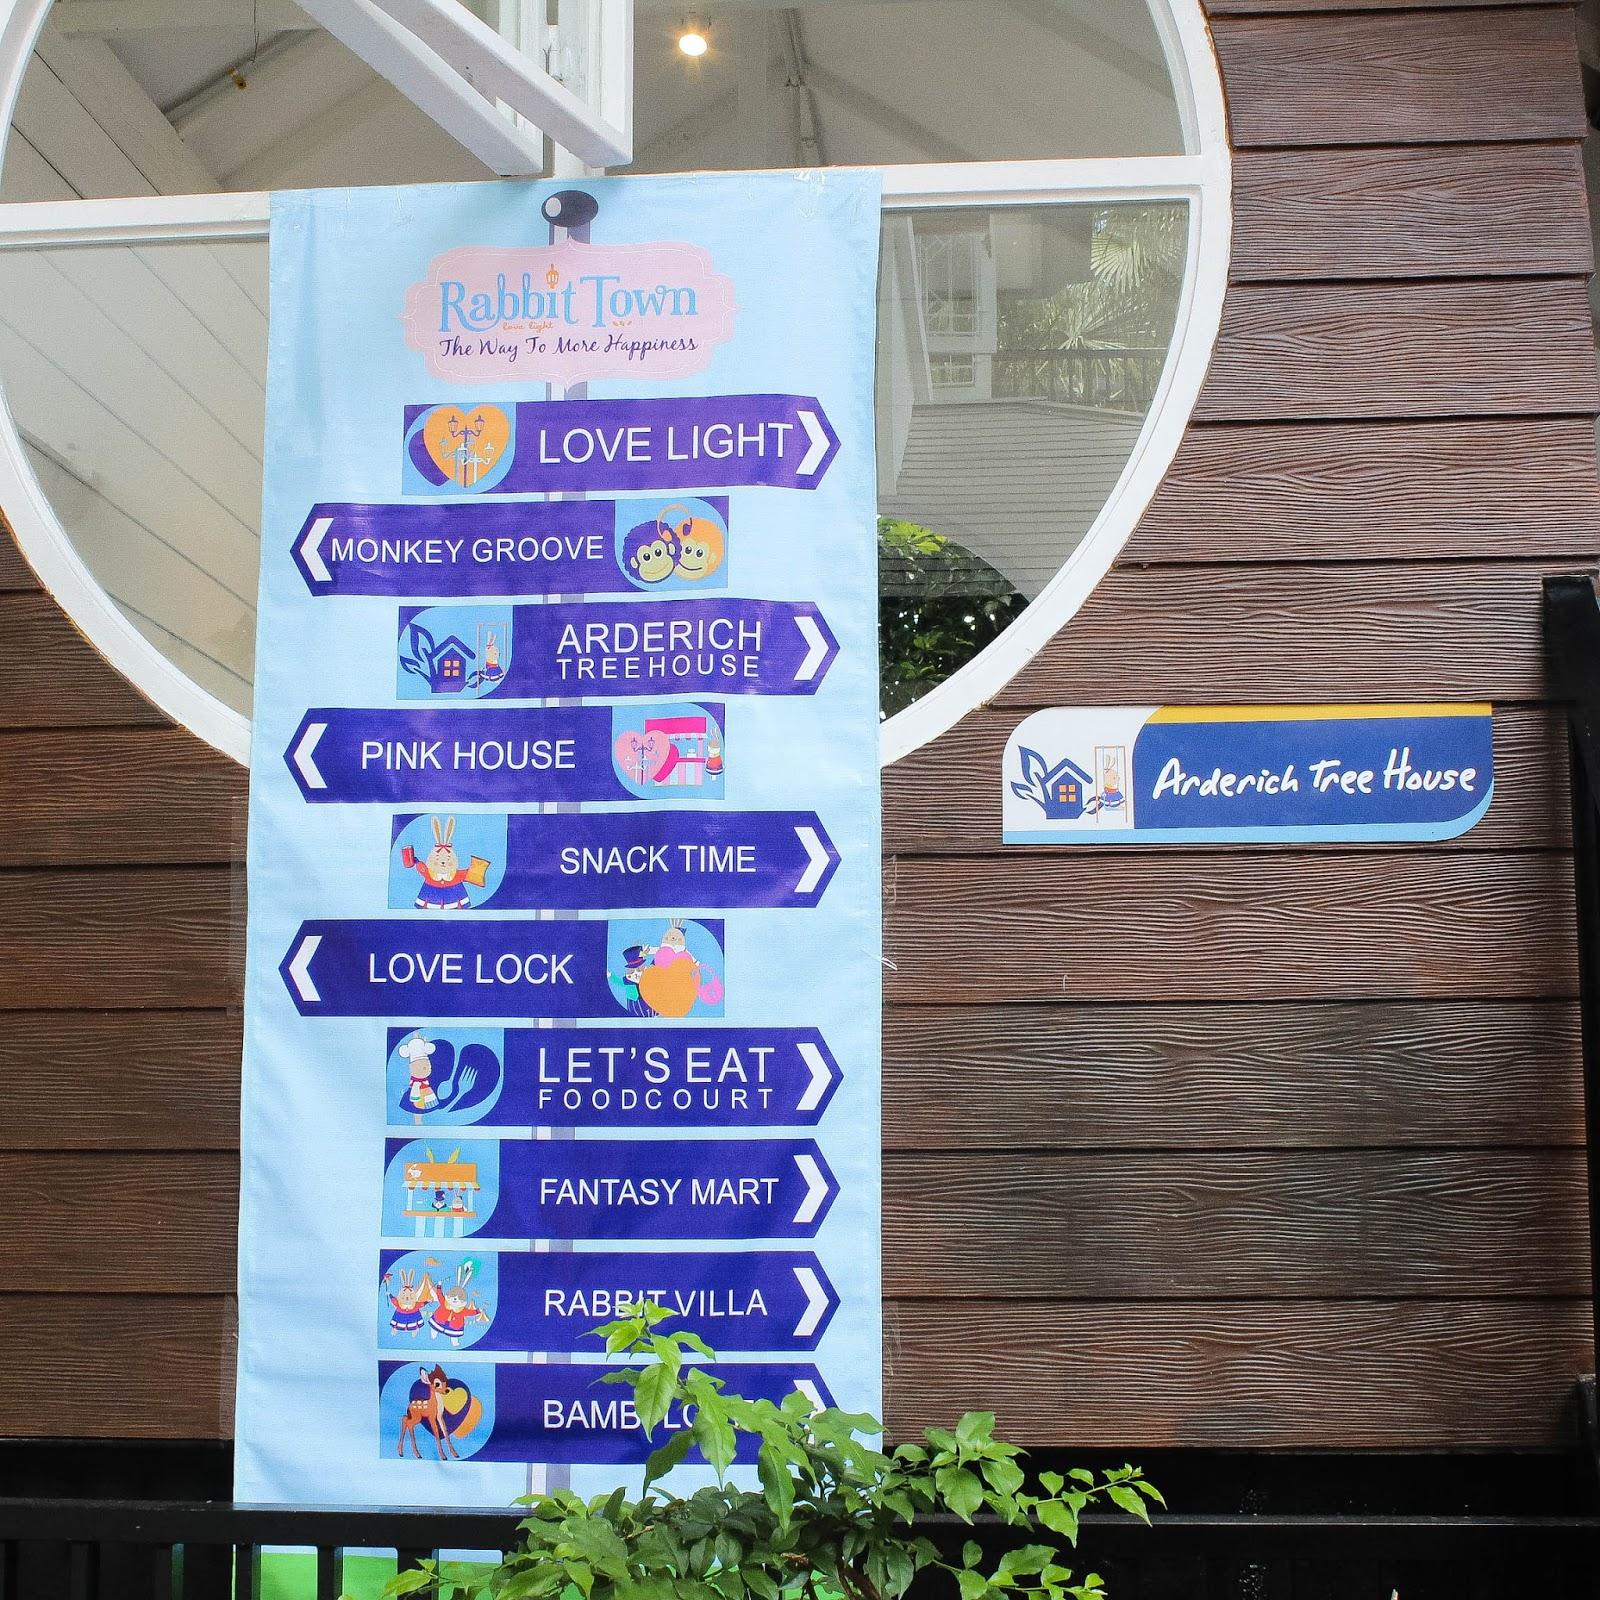 Rabbit Town Bandung Kids Holiday Spots Liburan Anak Informasi